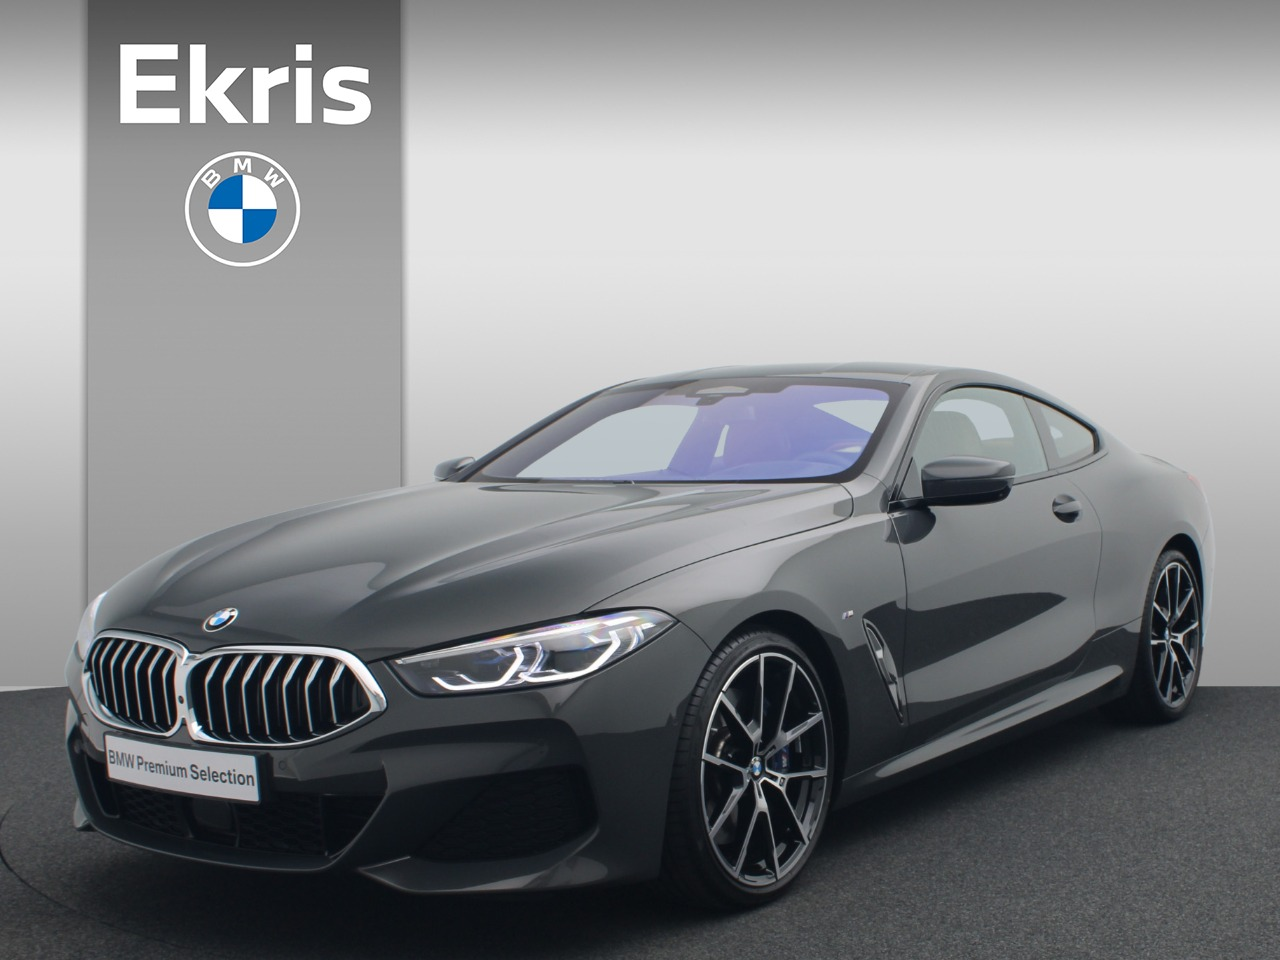 "Bmw 8 serie coupé 840i high executive m sportpakket / harman kardon / laserlight / driving assist prof. / stoelventilatie / 20"" - 2 jaar garantie"